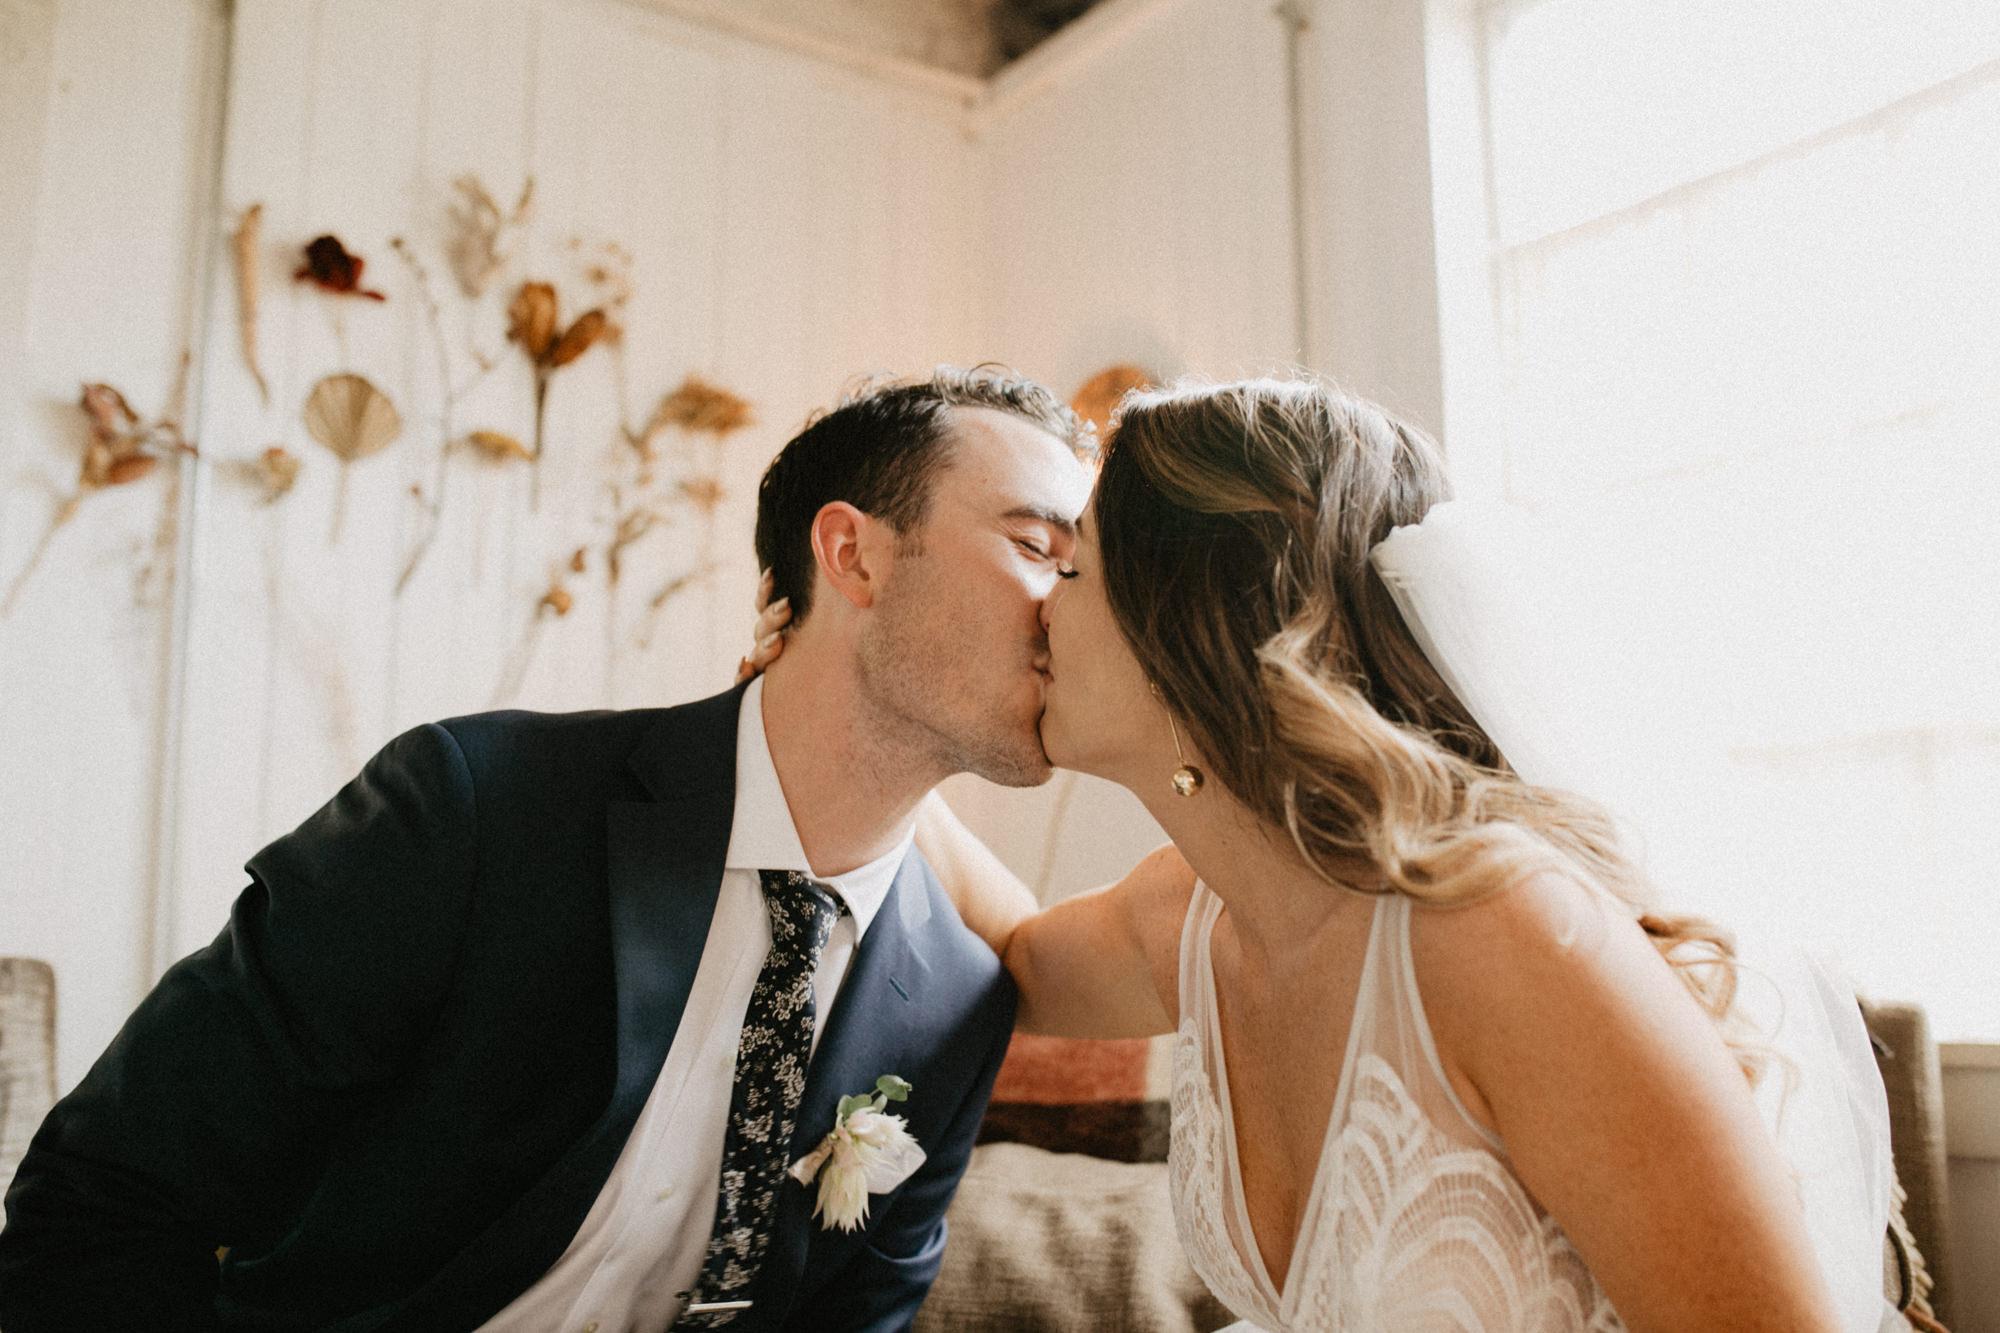 terrain-events-wedding-photographer-33.jpg